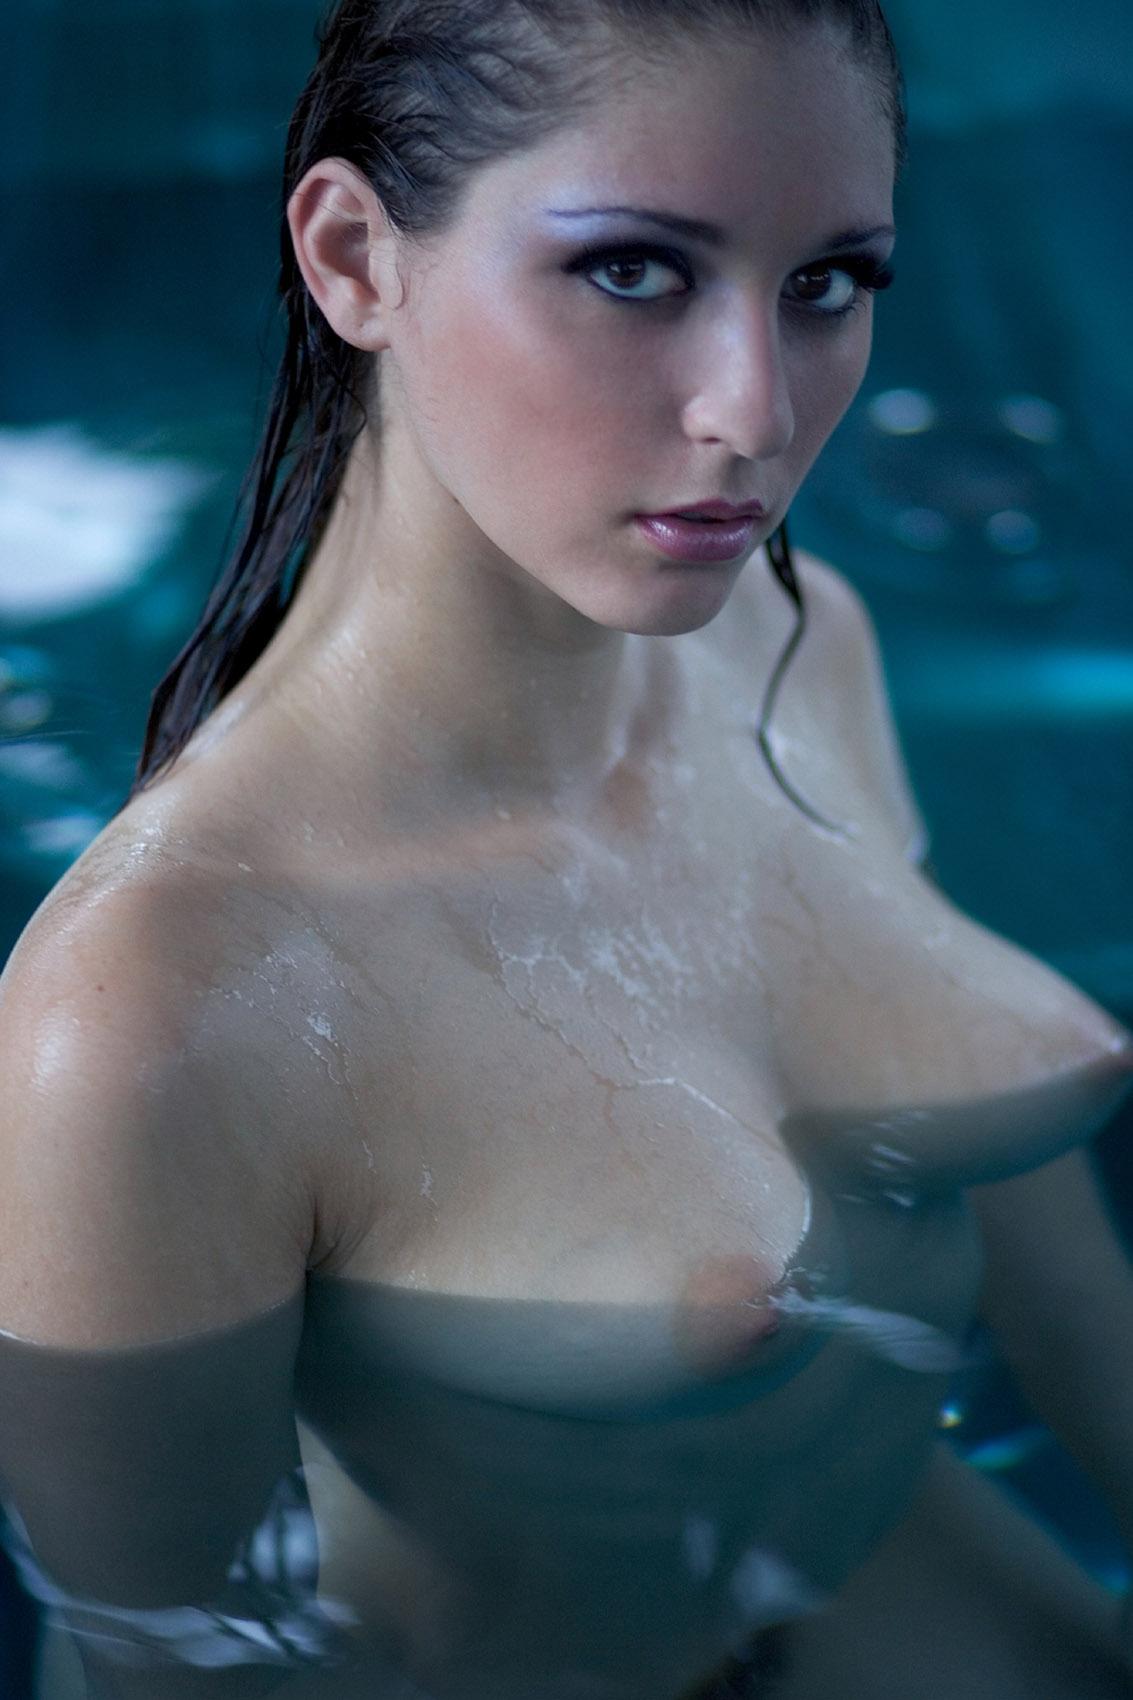 carlotta-champagne-nude-tits-jacuzzi-wet-20